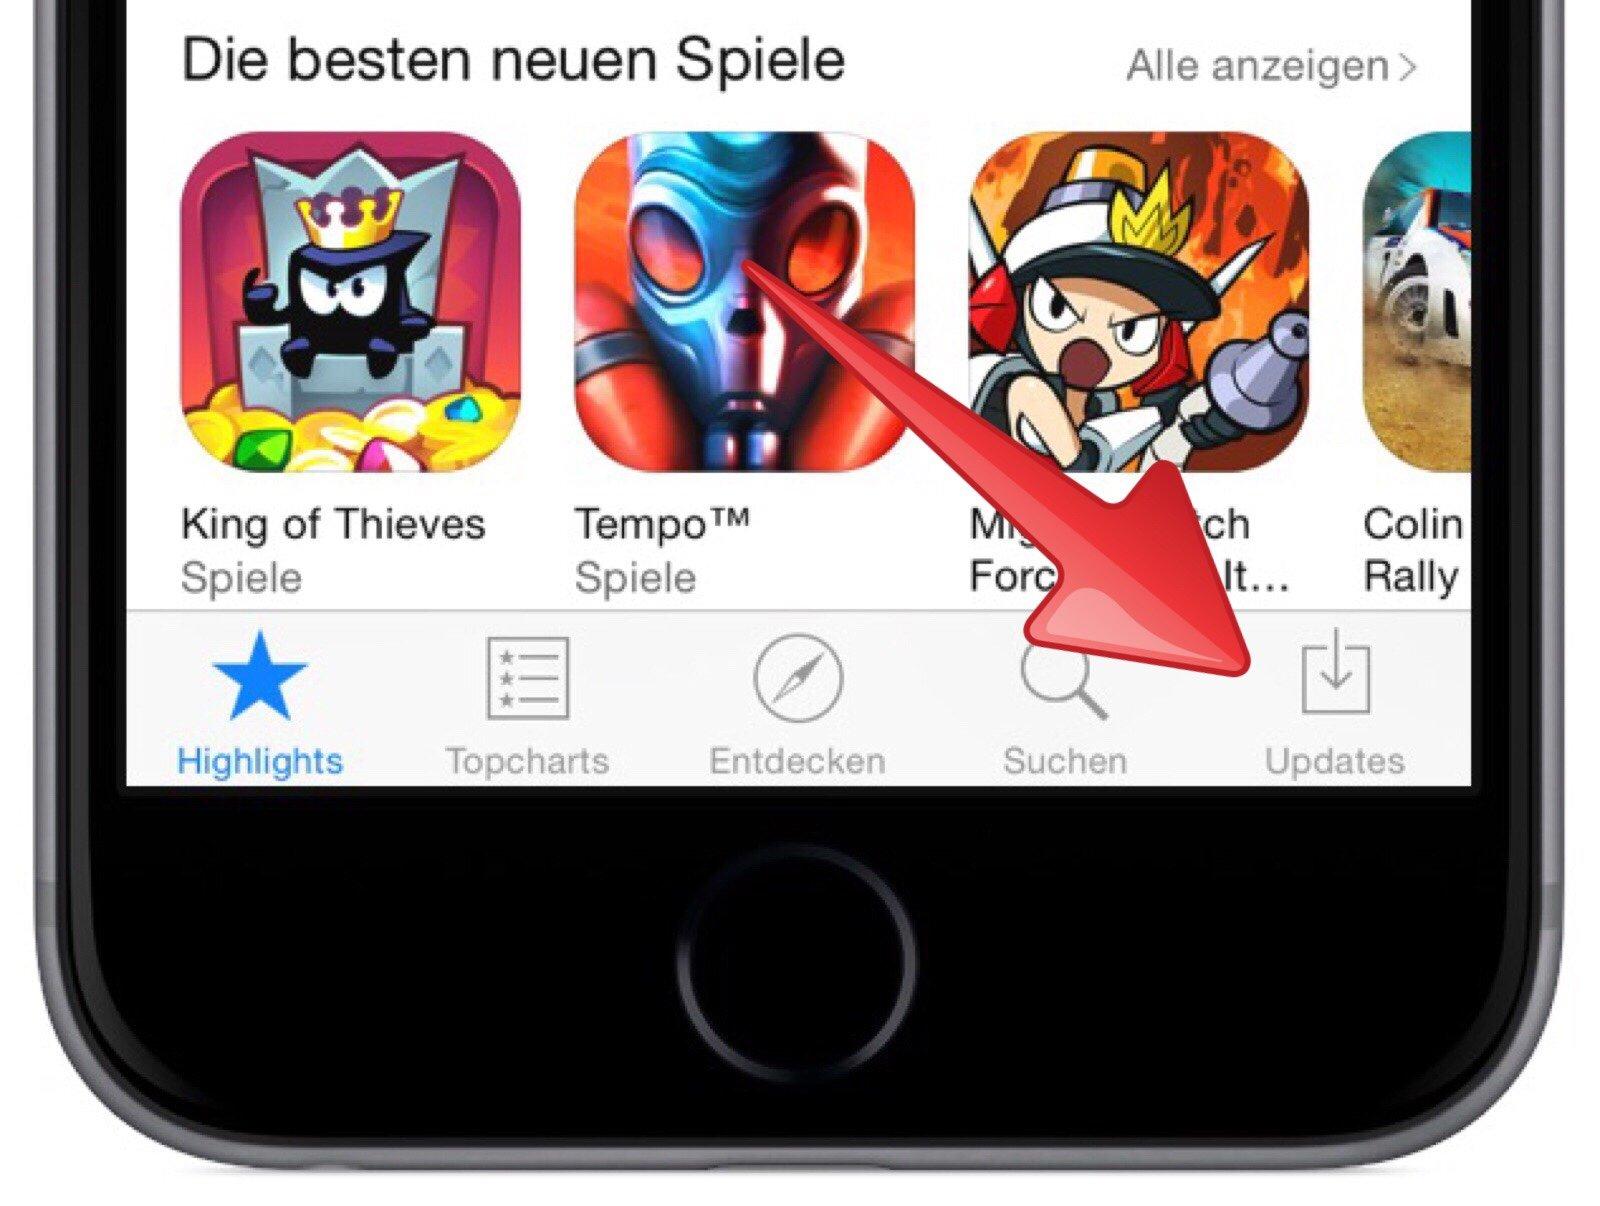 app gelöscht wiederherstellen iphone